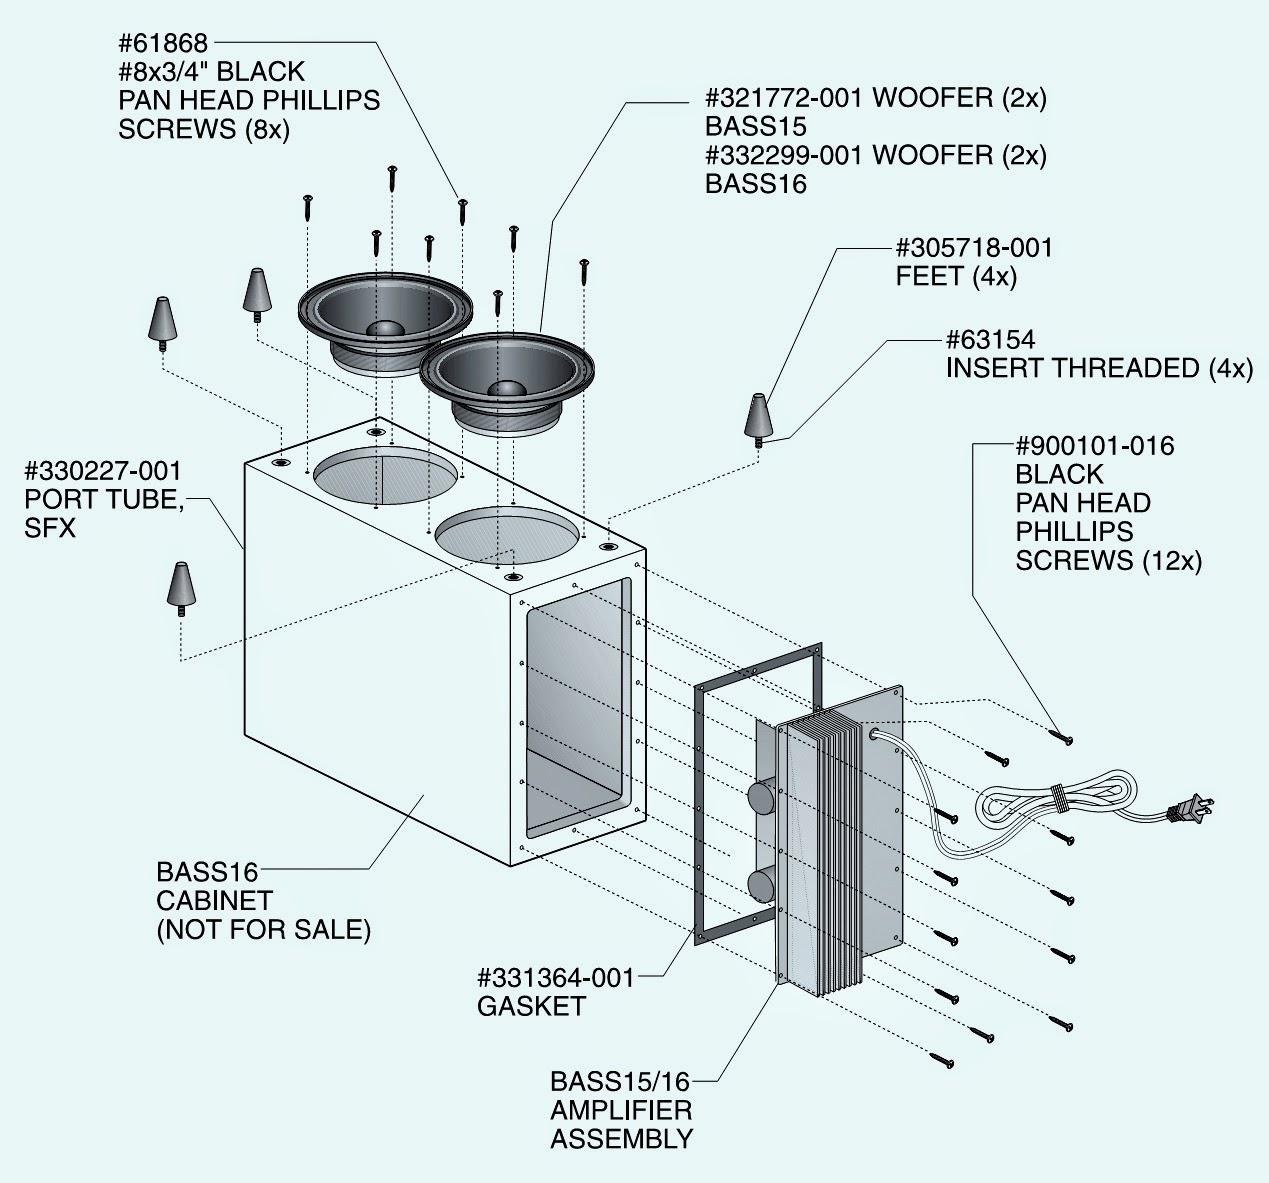 JBL    BASS15      JBL    BASS16  SCHEMATIC    DIAGRAM      Powered SubWoofer   Electro help